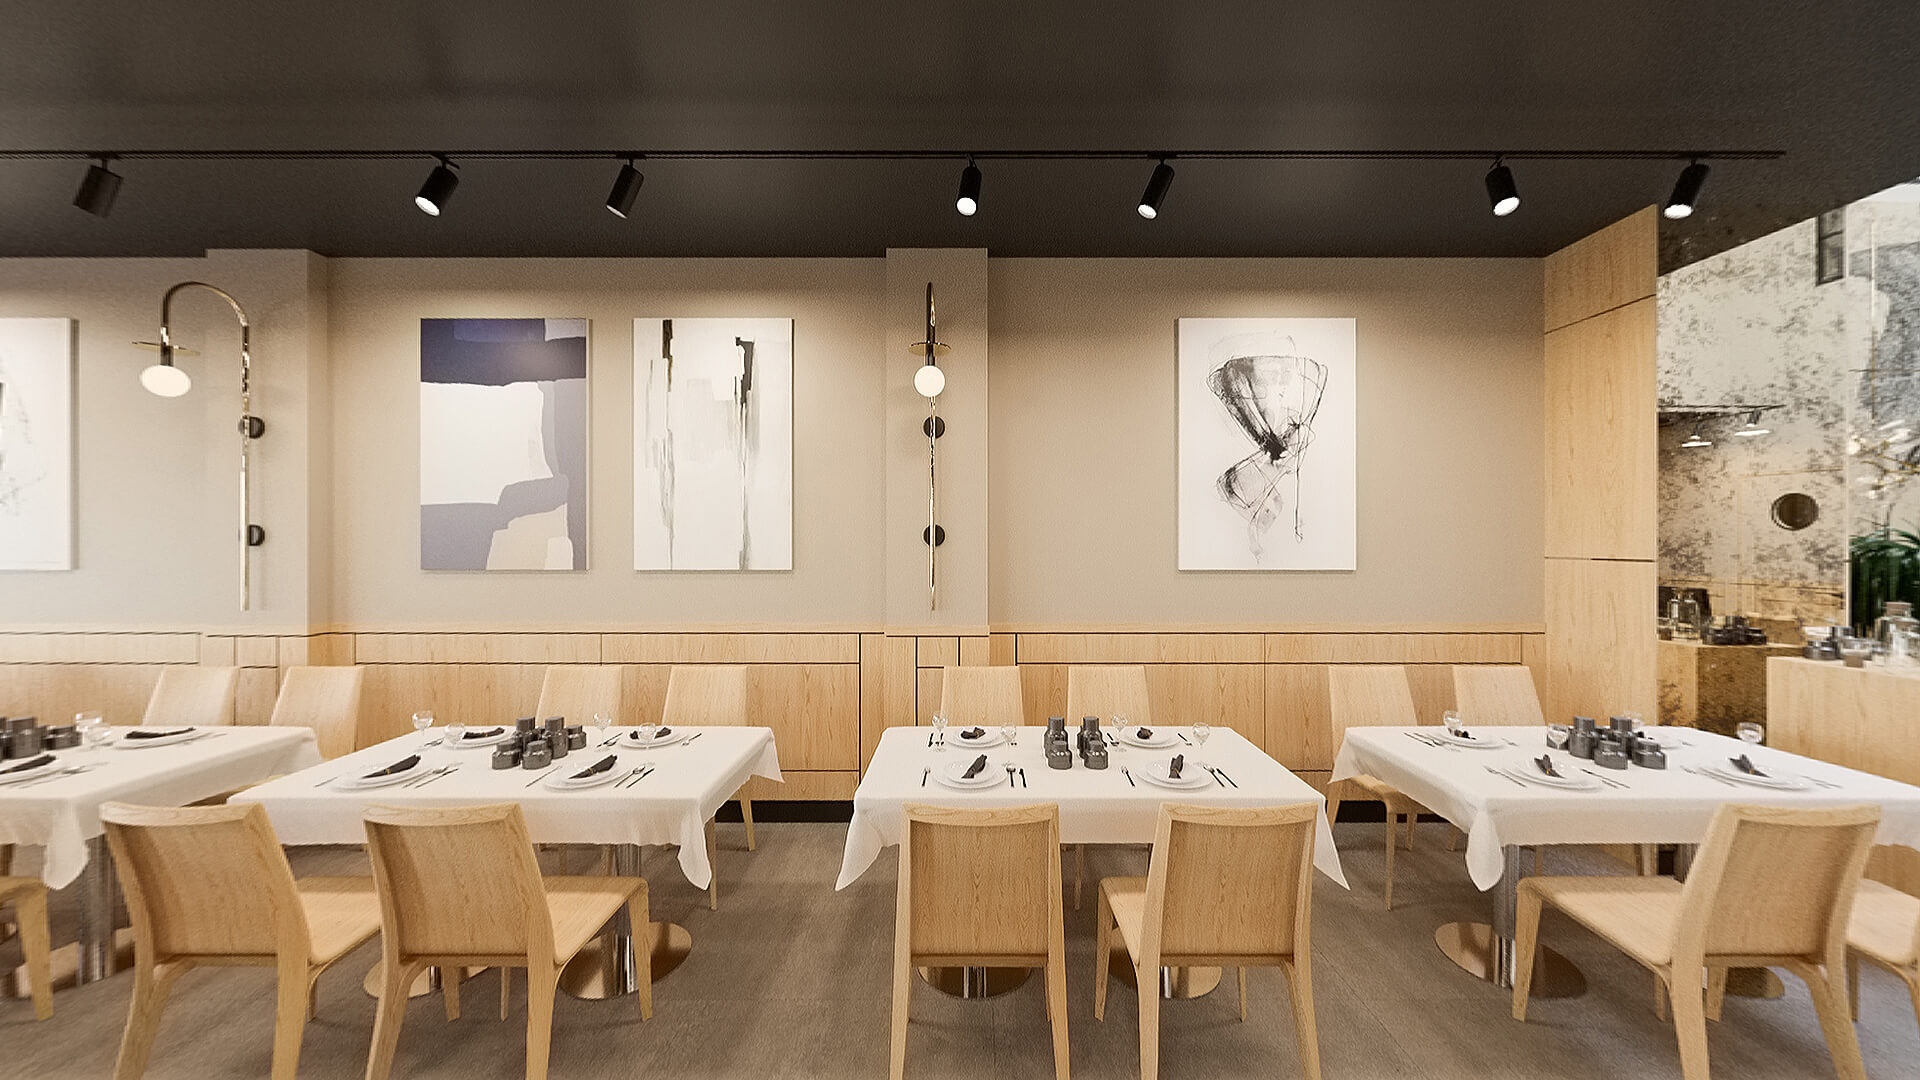 moya-restaurant-interior-design-1.jpg